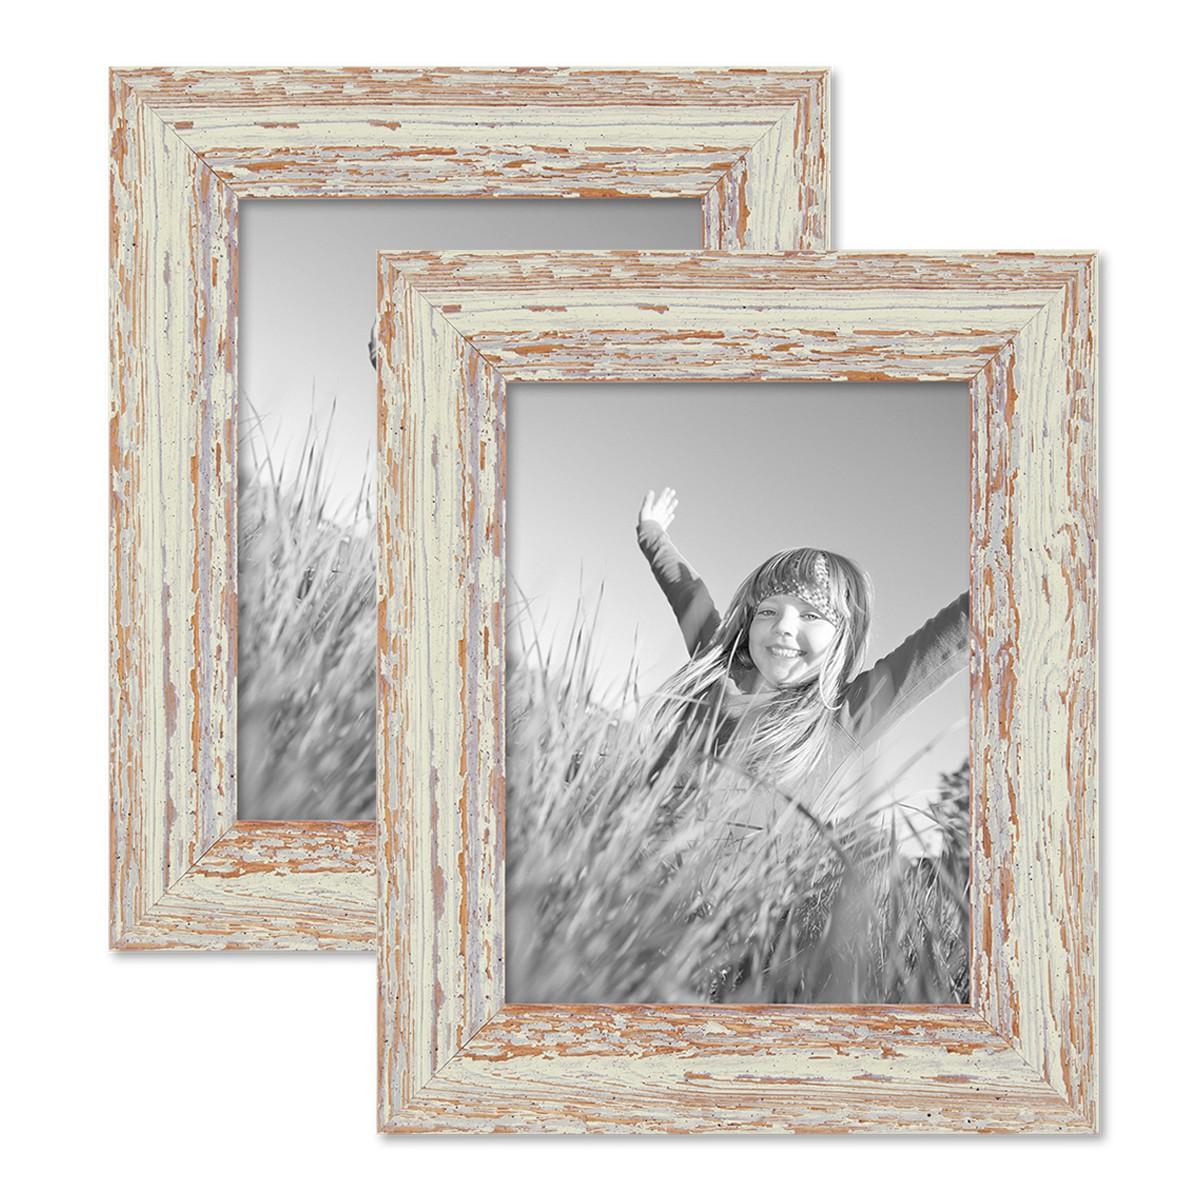 Vintage Bilderrahmen 2er Set 15x20 cm Weiss Shabby-Chic